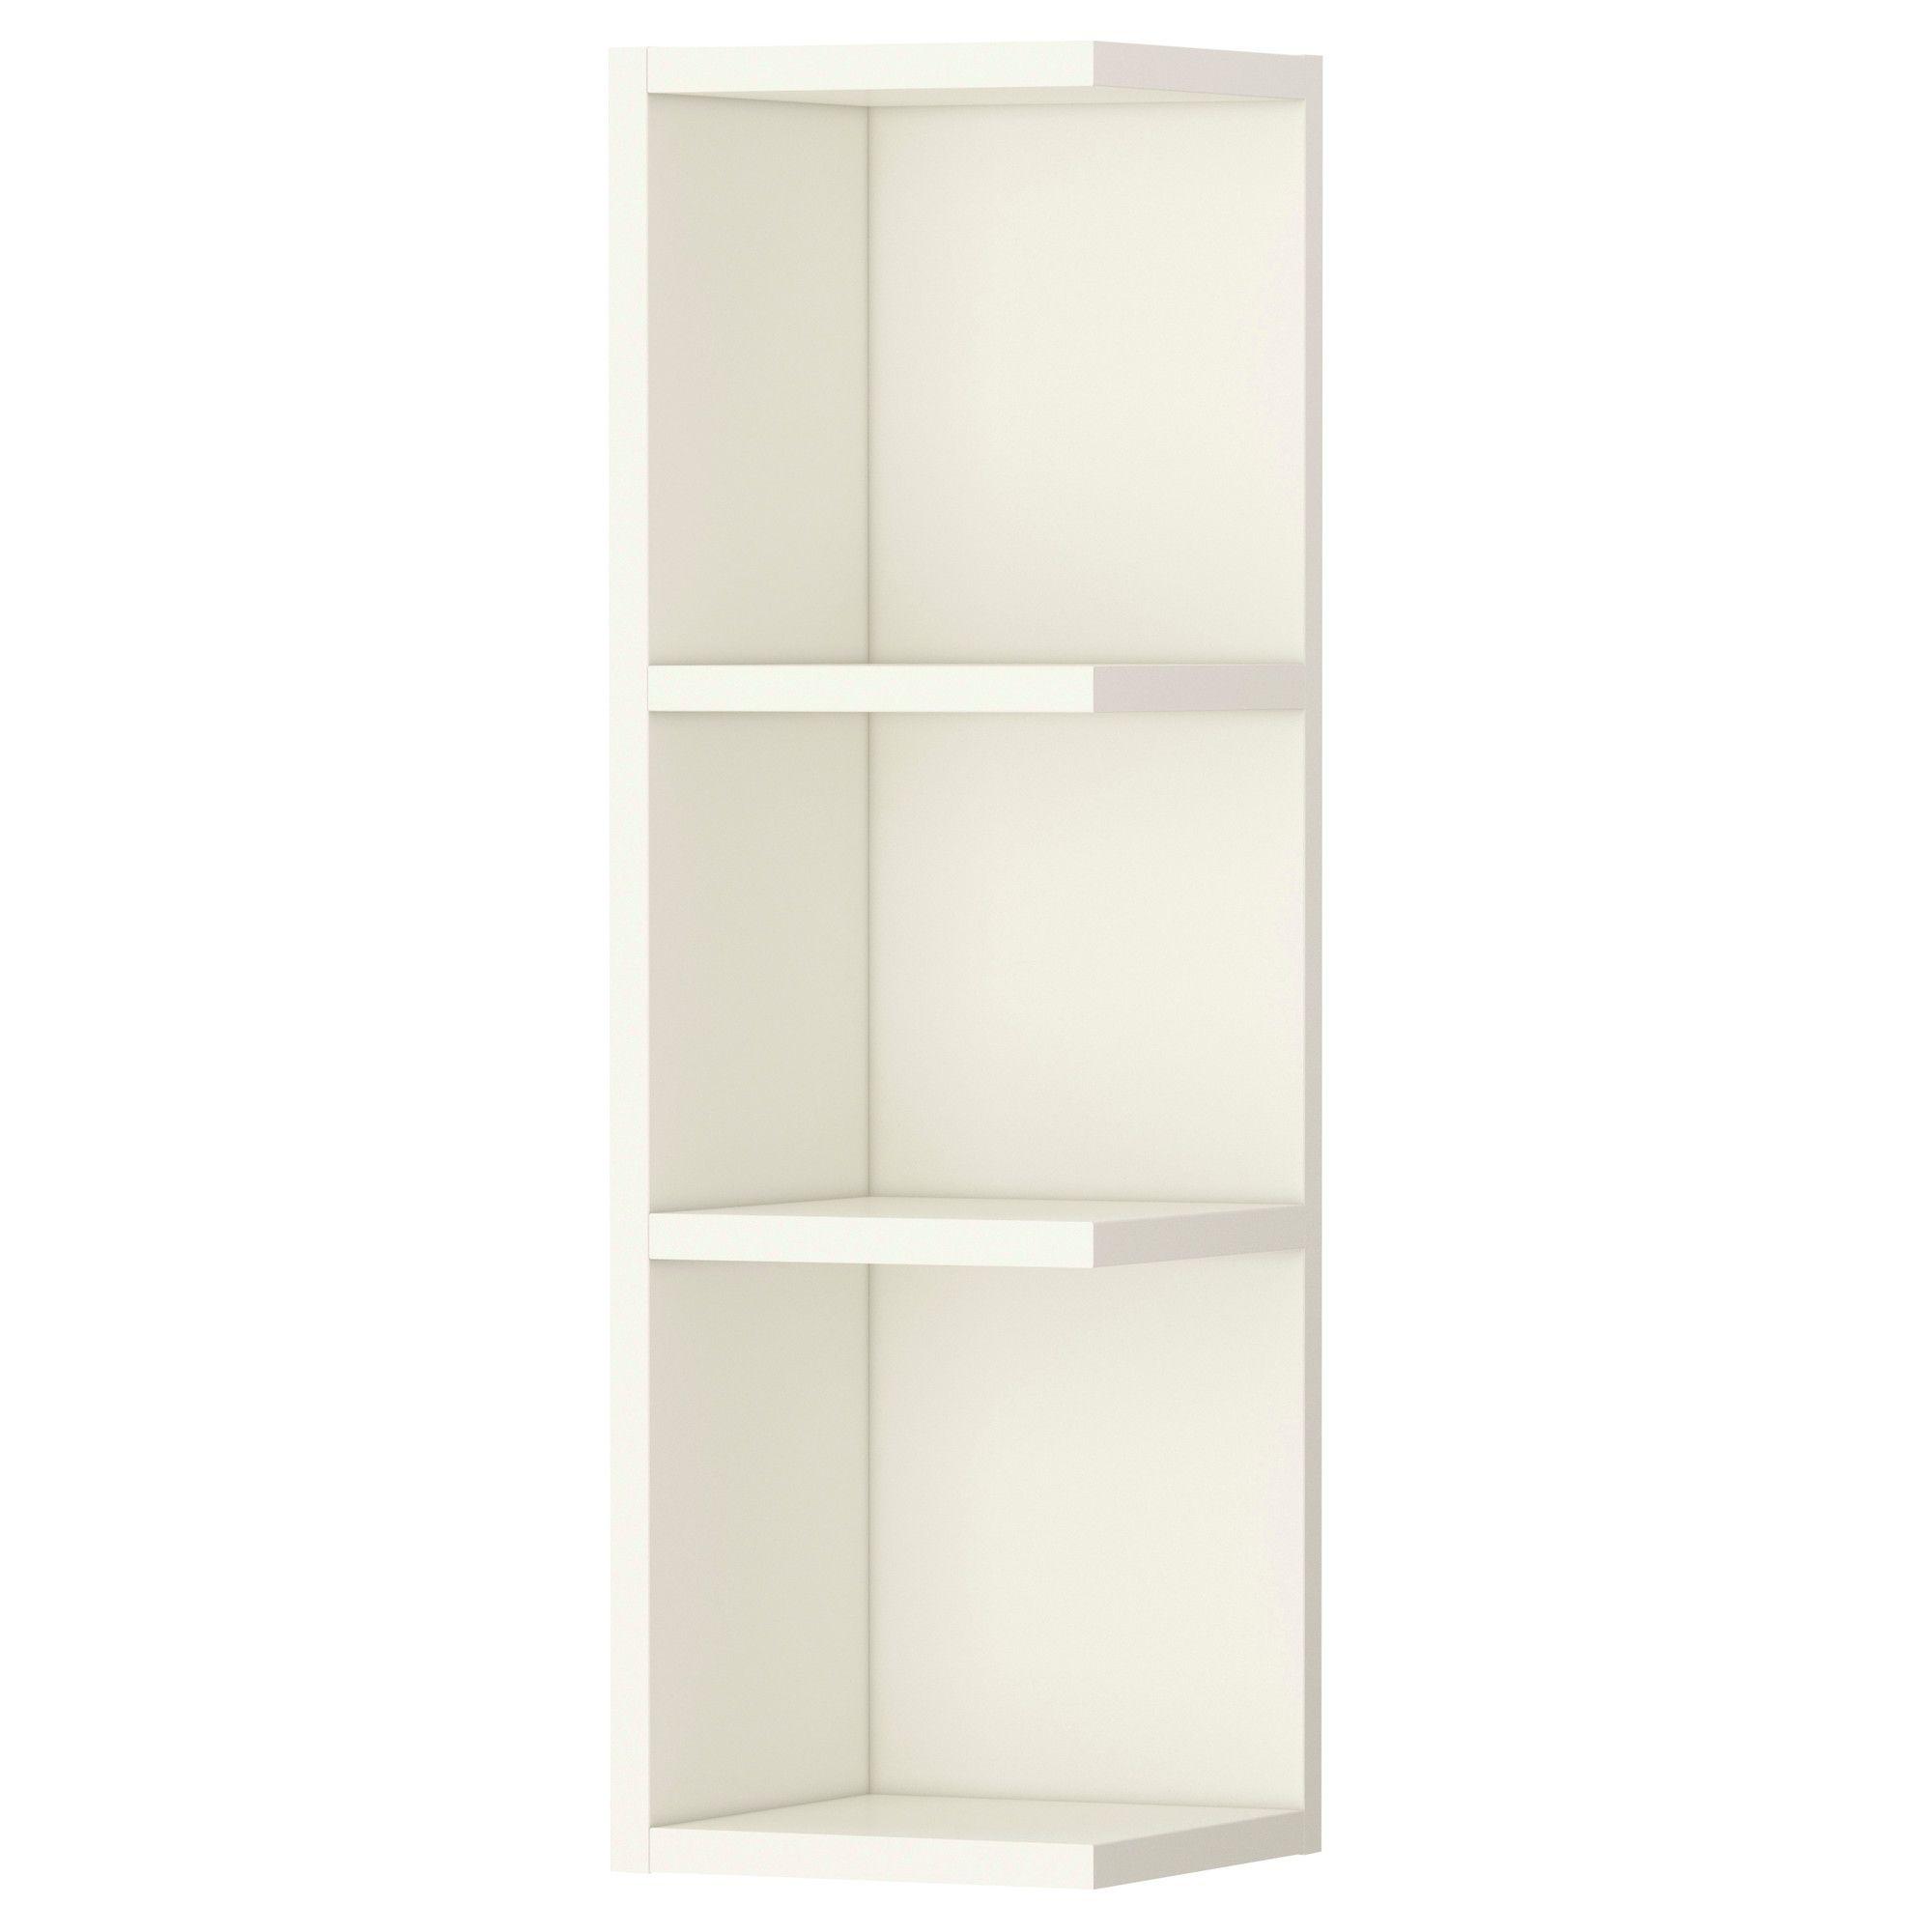 Lillangen End Unit White Ikea Ikea Bathroom Storage Ikea Shelving